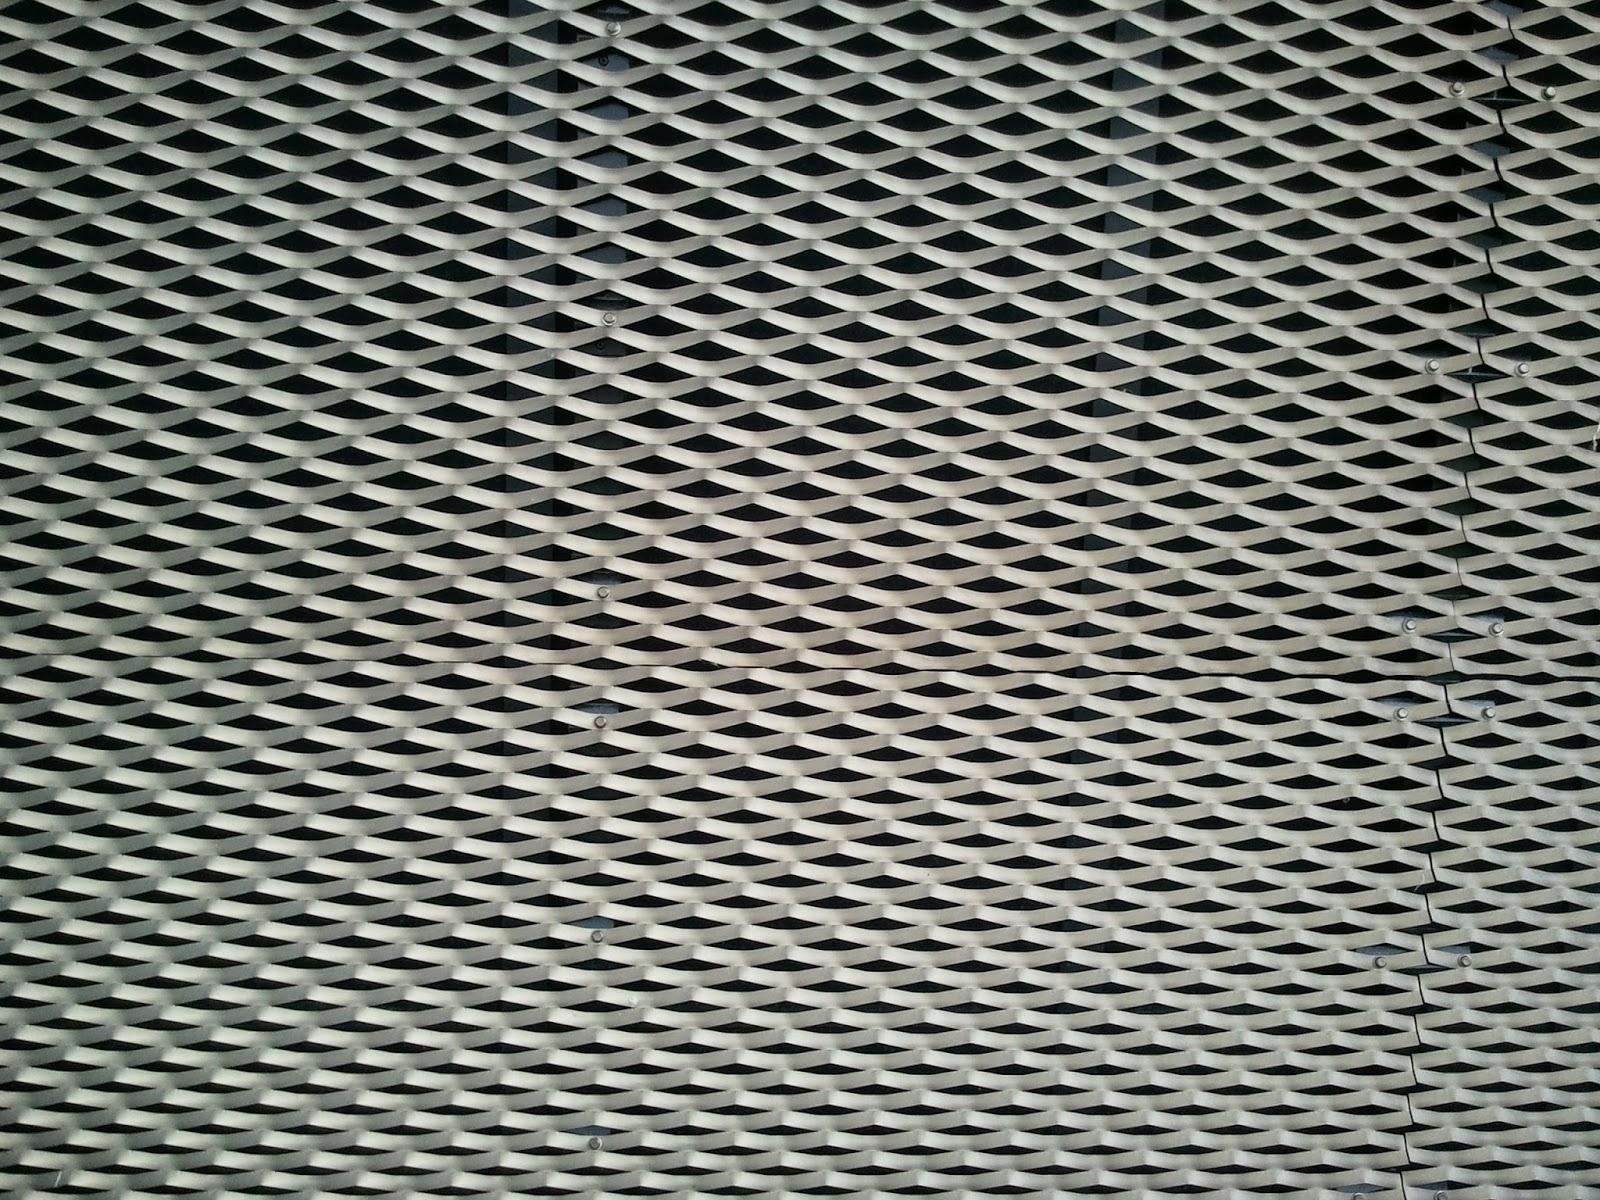 Metal Mesh, Public Domain Texture